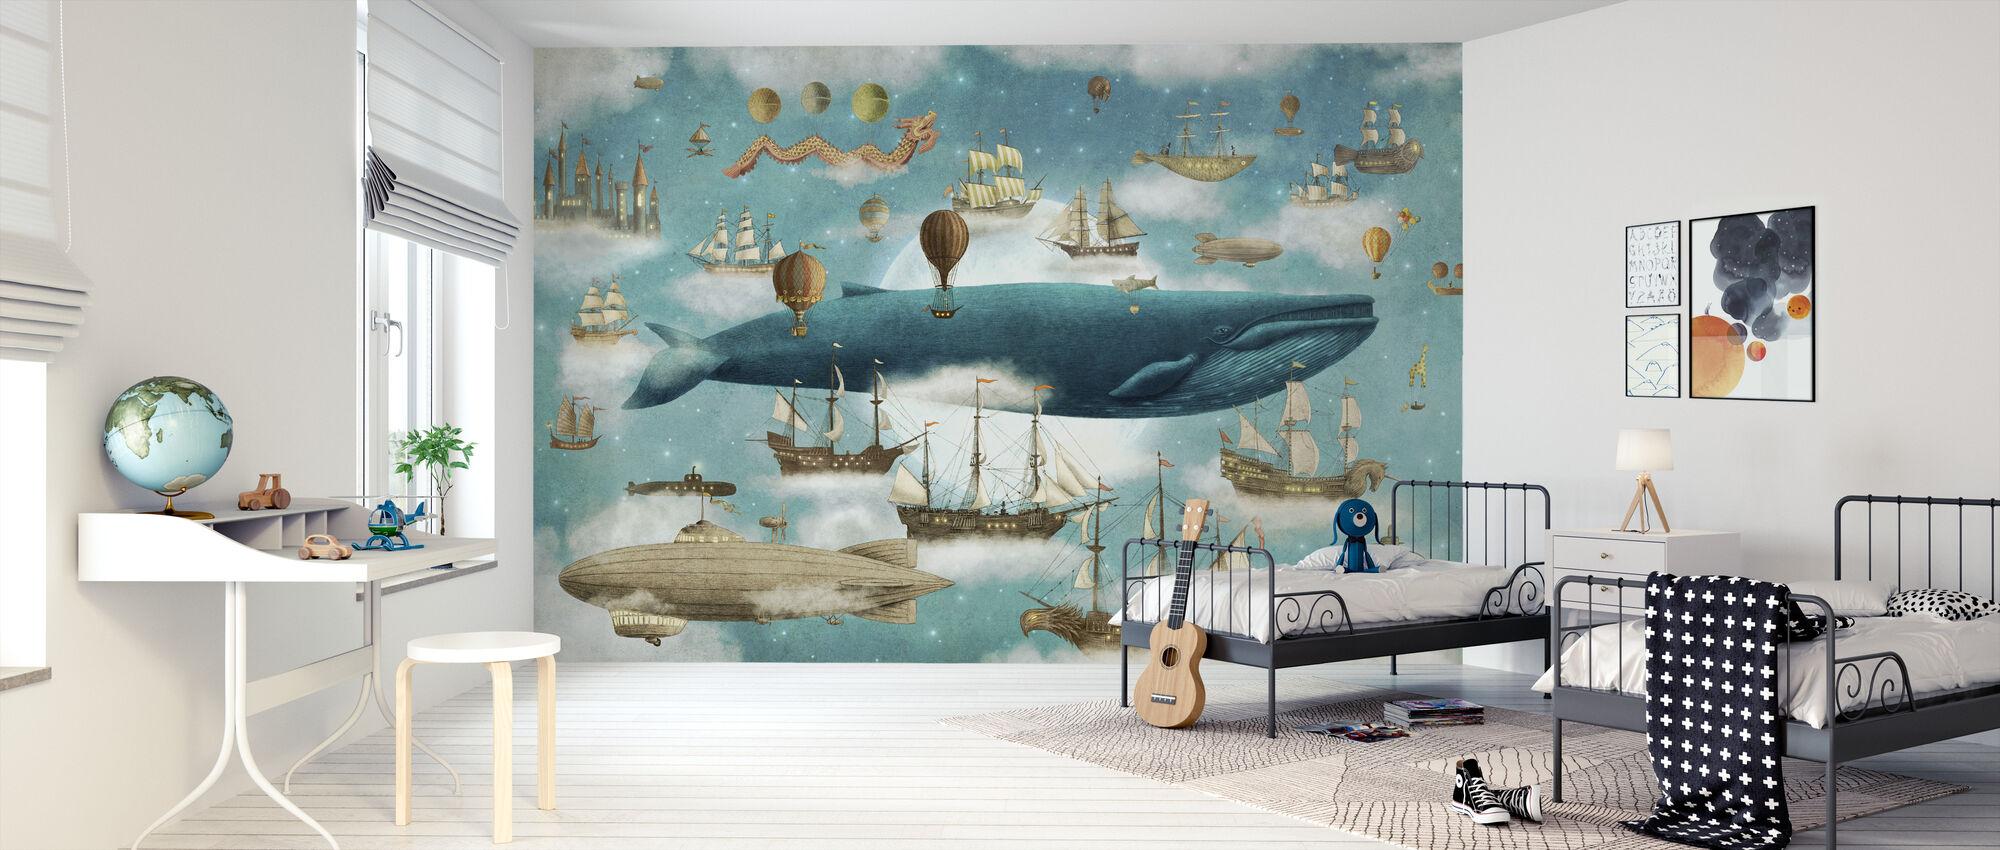 Ocean Meets Sky Cover - Wallpaper - Kids Room